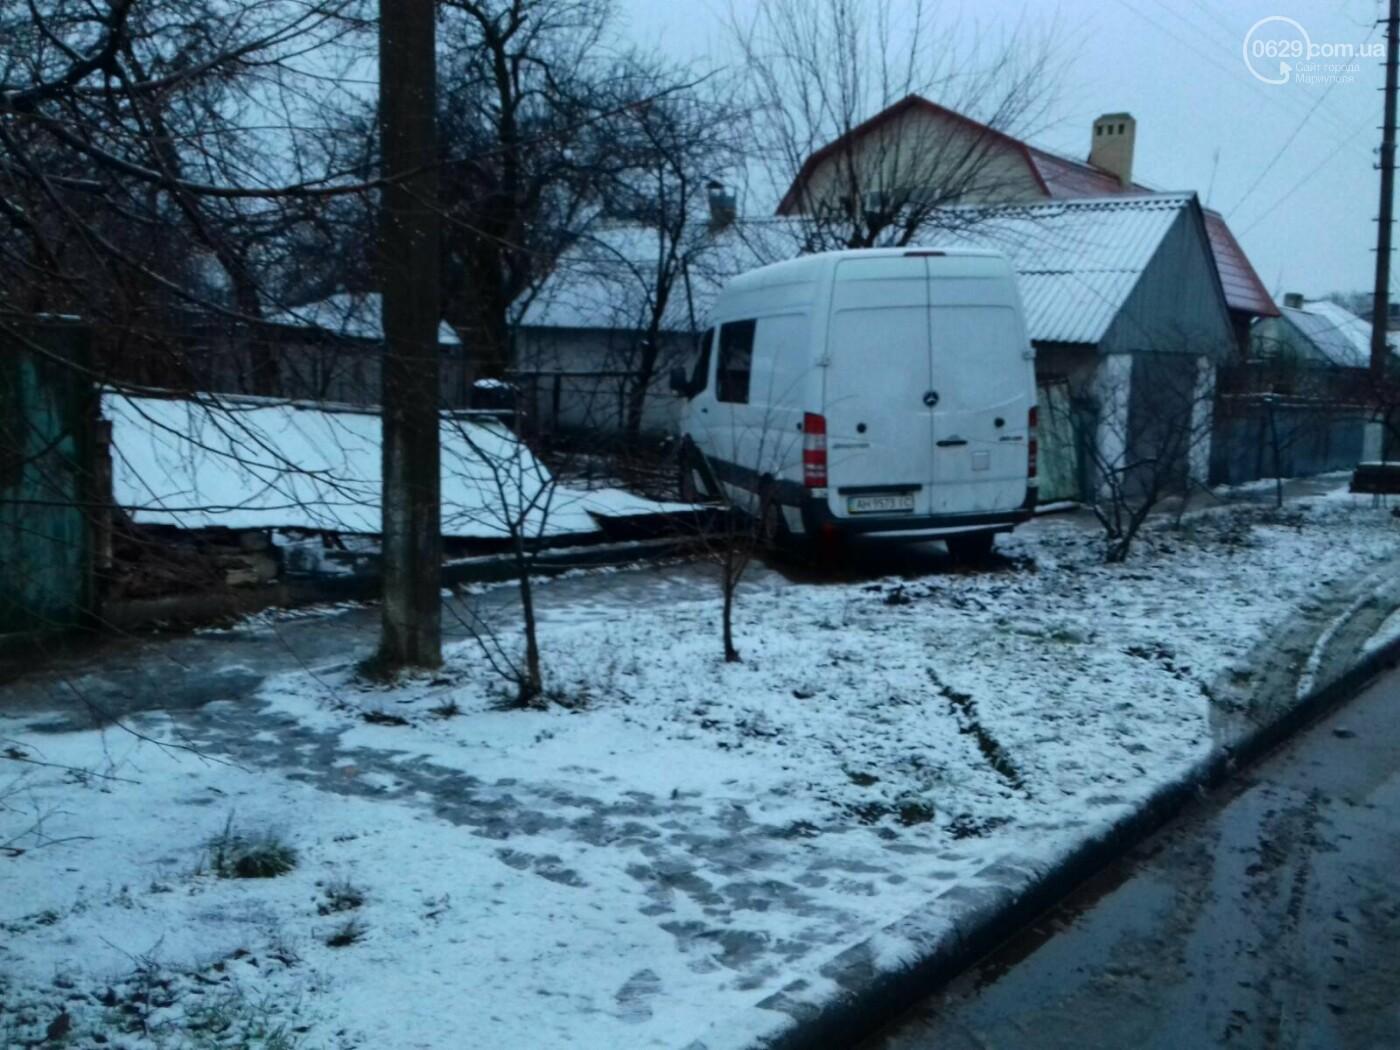 На Левобережье Мариуполя микроавтобус врезался в забор жилого дома, - ФОТО, фото-4